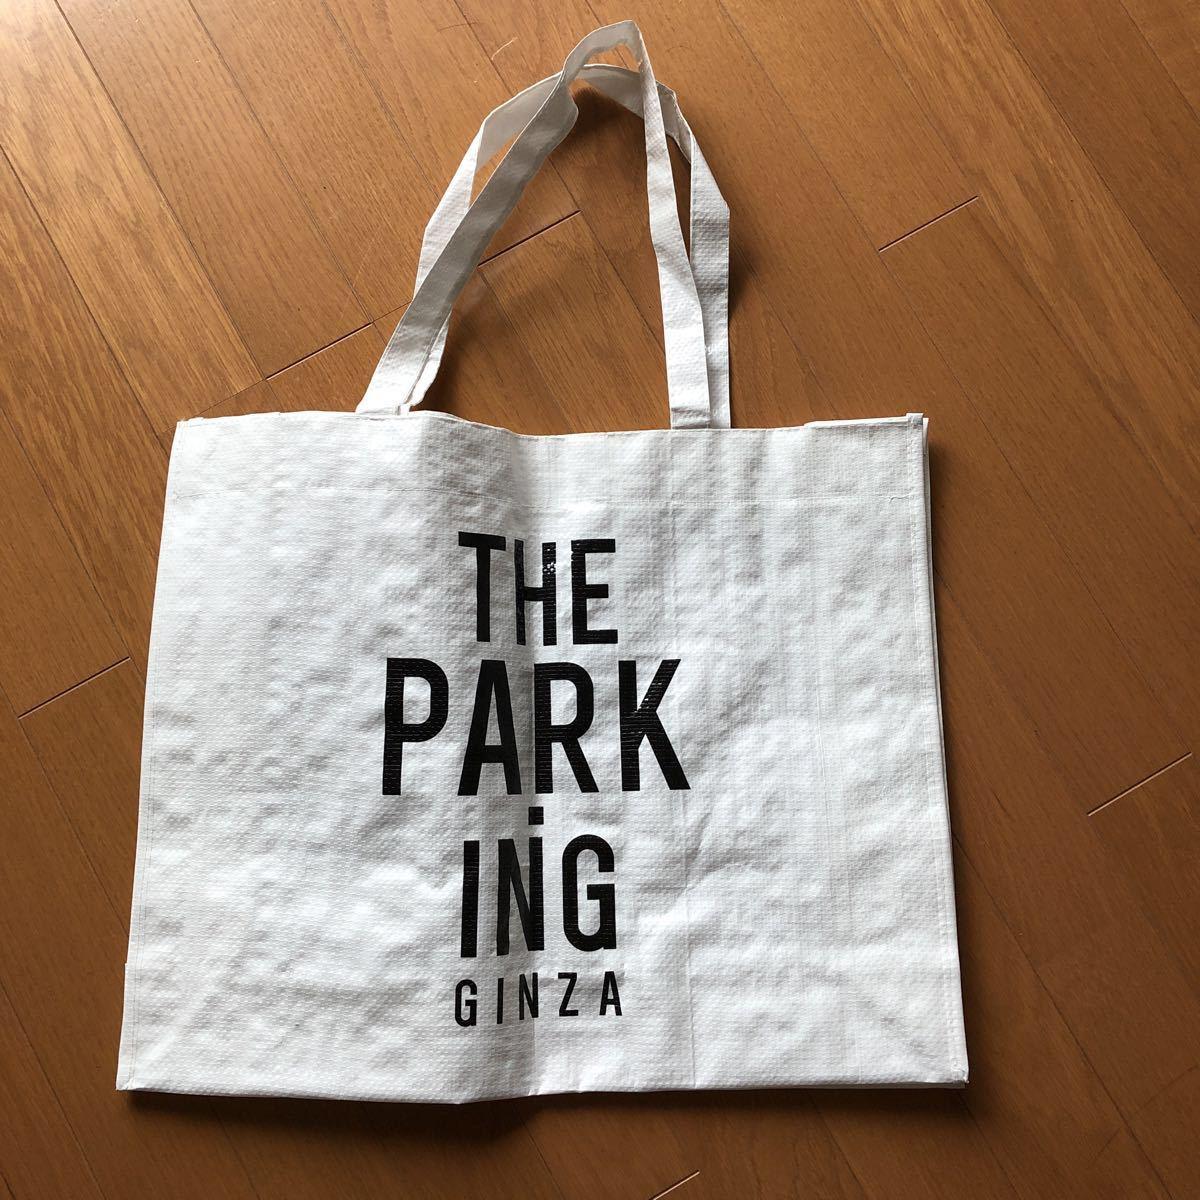 THE PARKING GINZA パーキング ギンザ トートバッグ 藤原ヒロシfragment